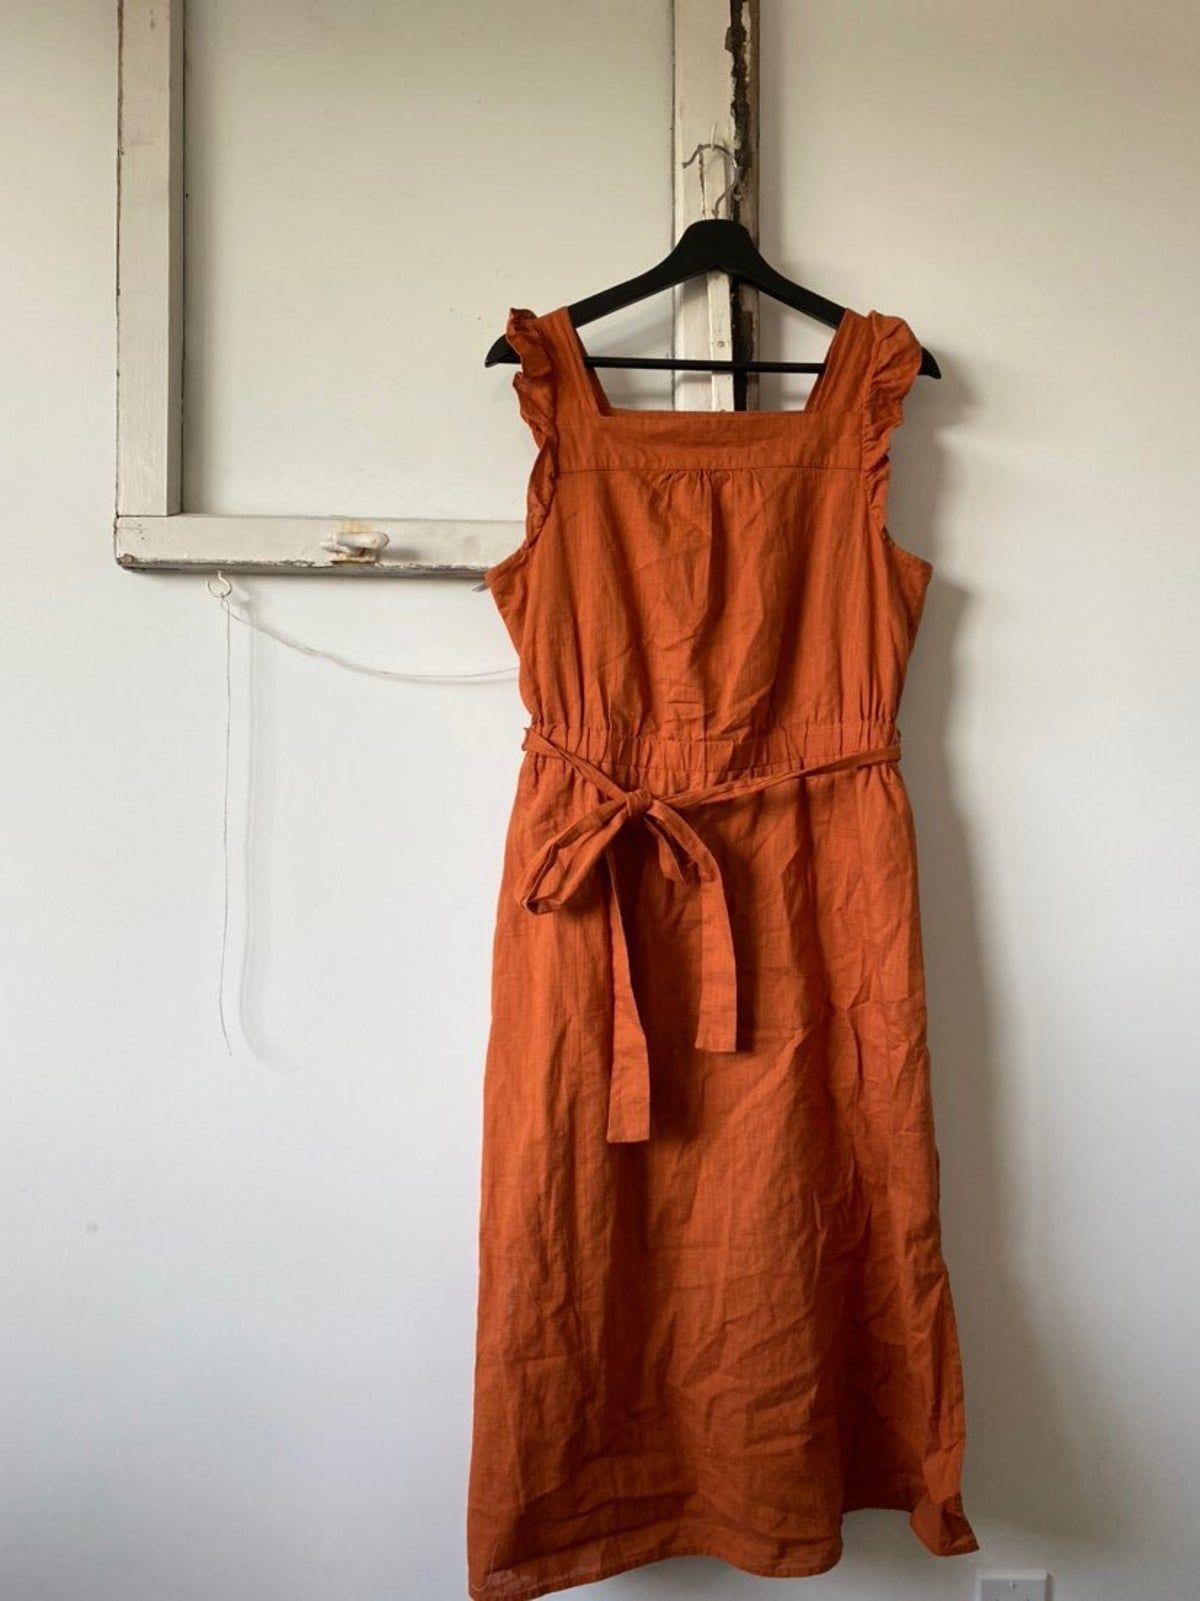 Womens Dress Burnt Orange Burnt Orange Dress Womens Dresses Dresses [ 1601 x 1200 Pixel ]